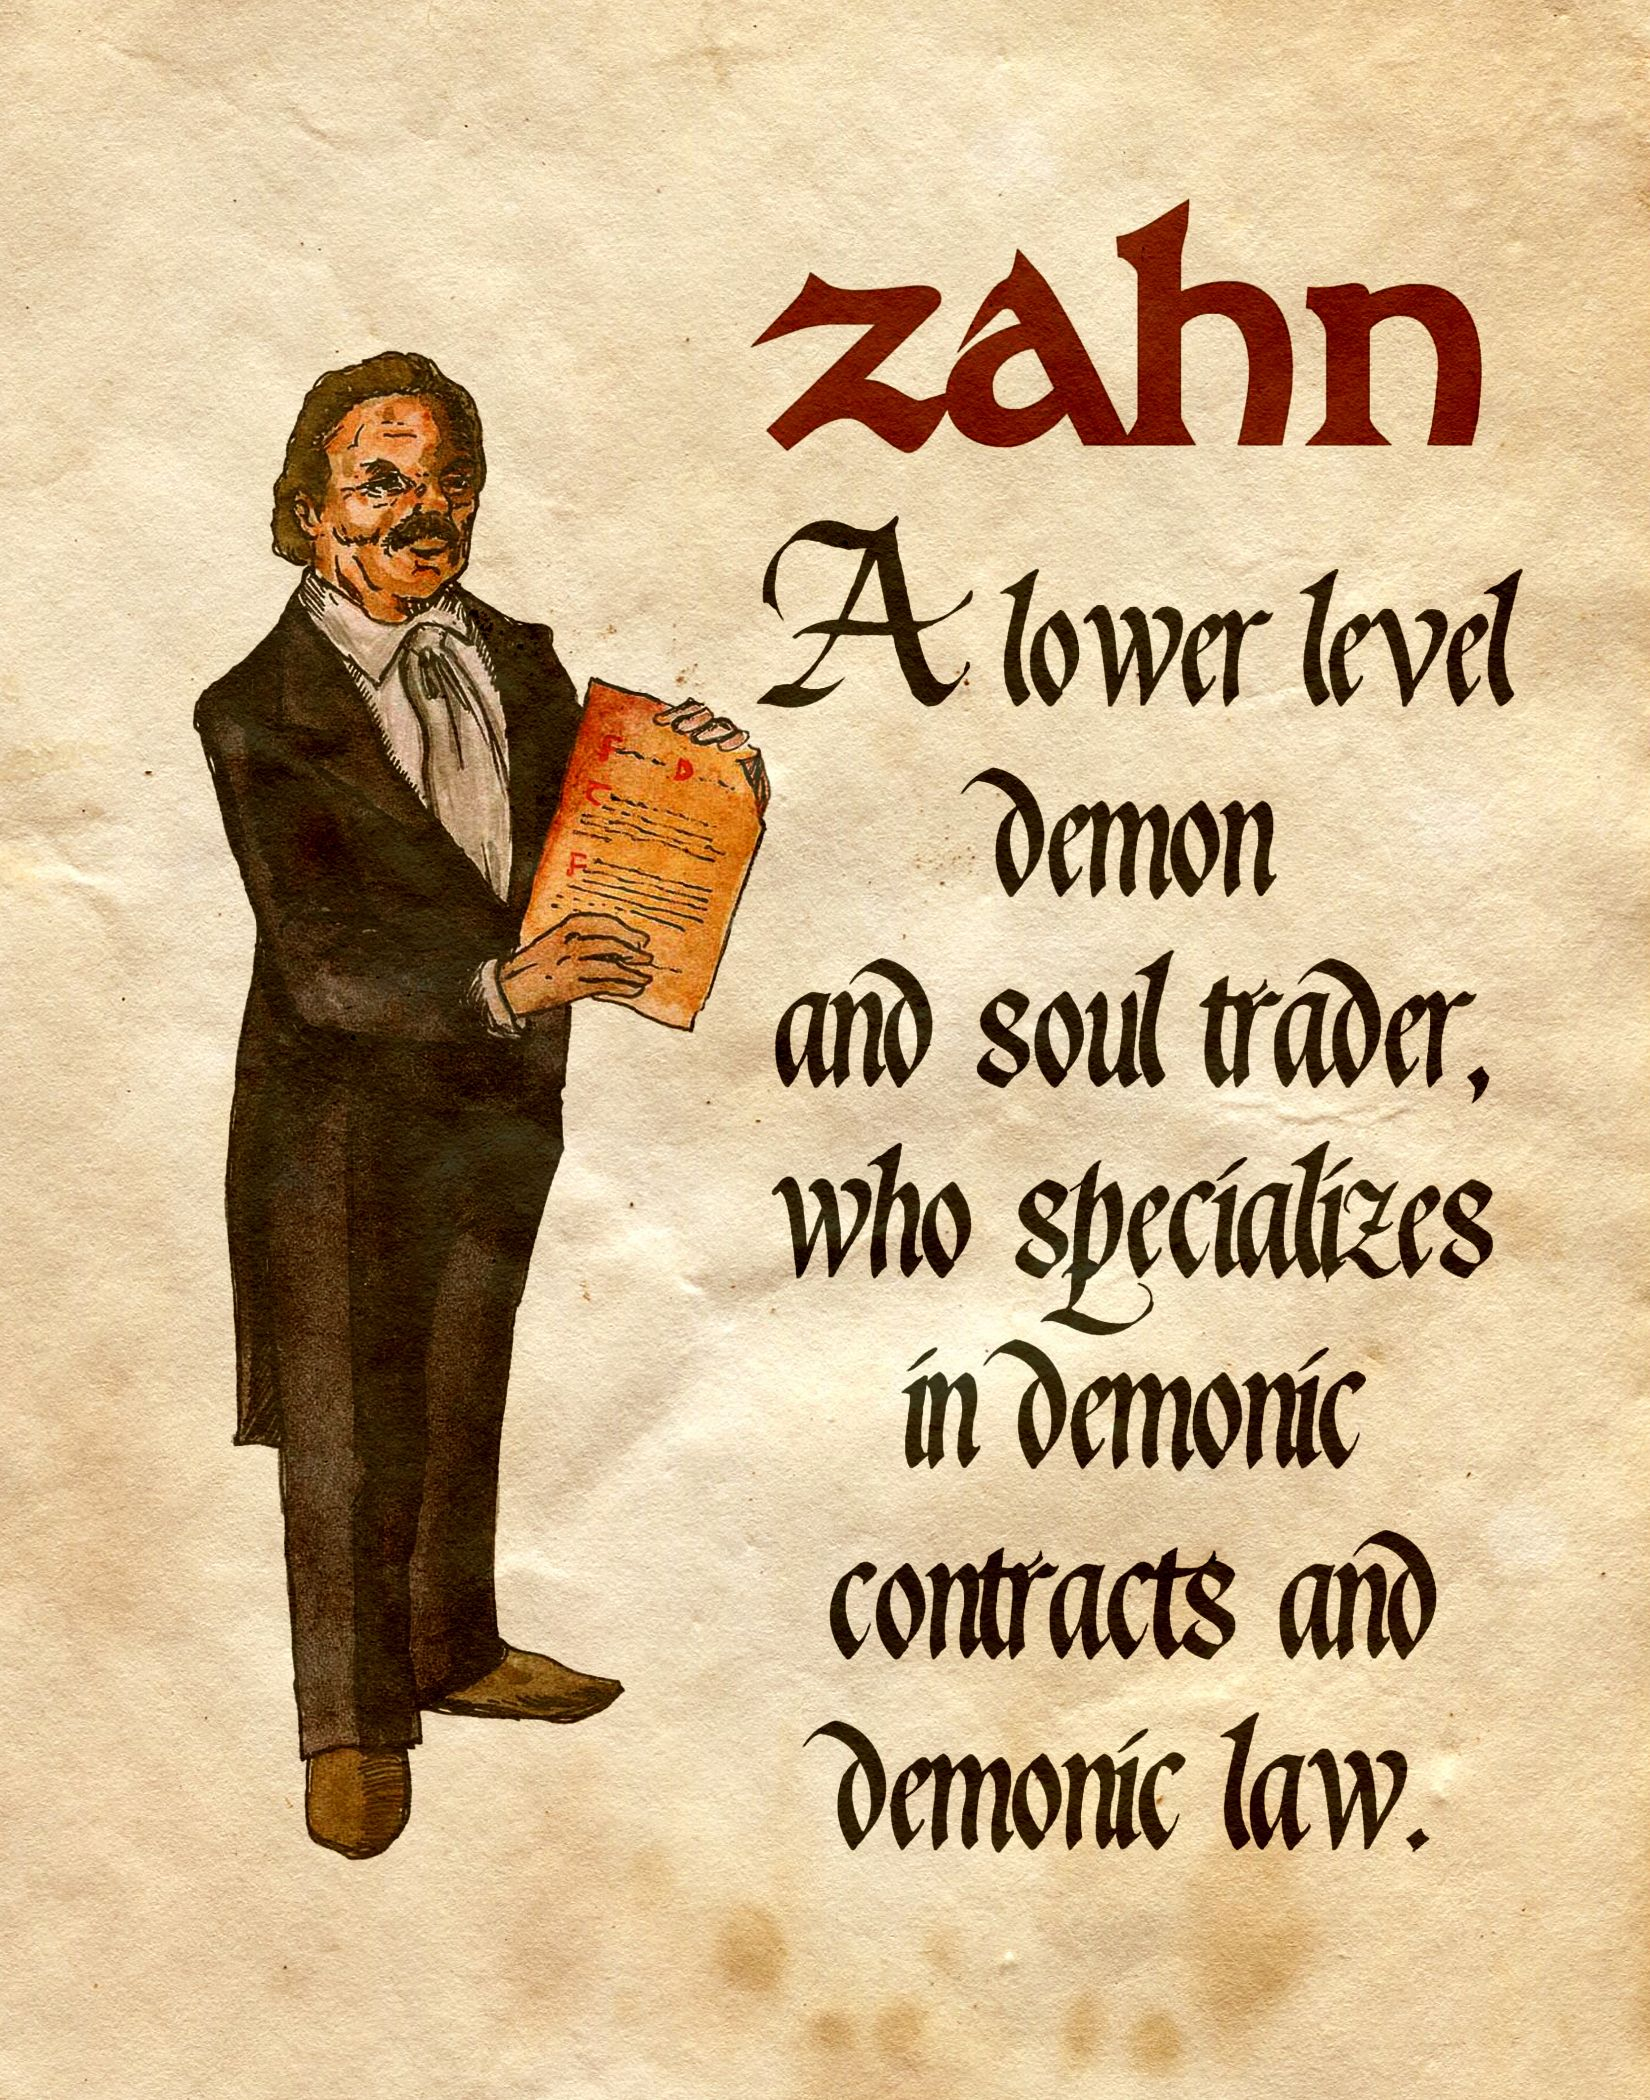 """Zahn"" - Charmed - Book of Shadows"